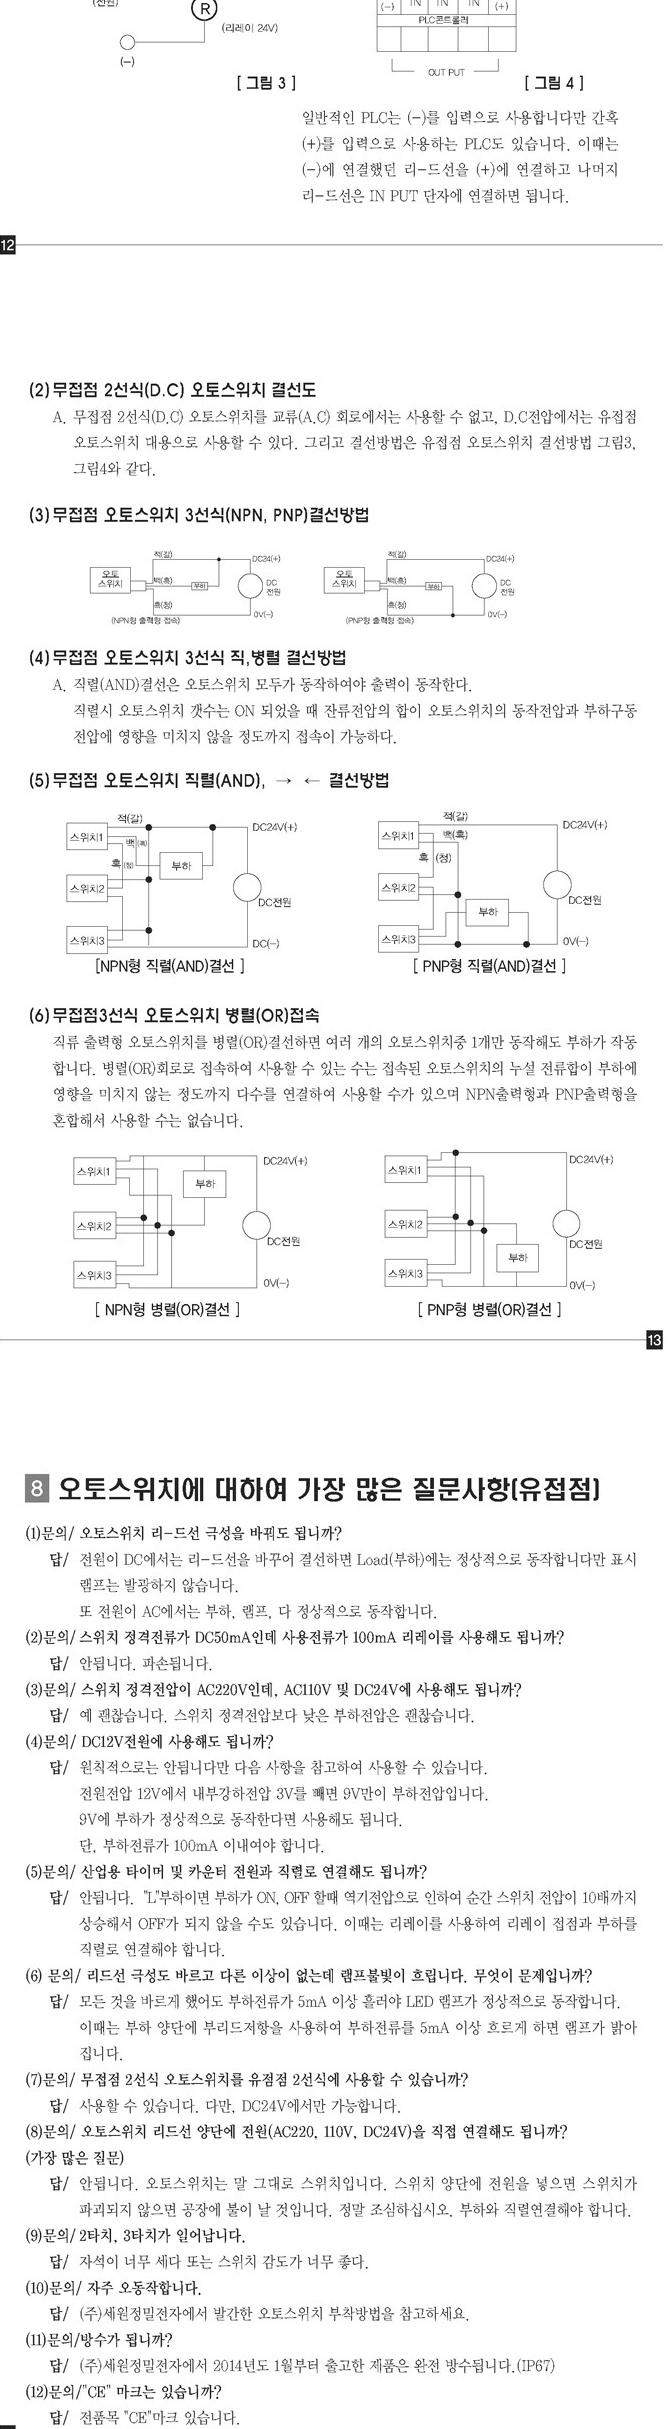 Saewon Electronics Auto Switches Terminology  4